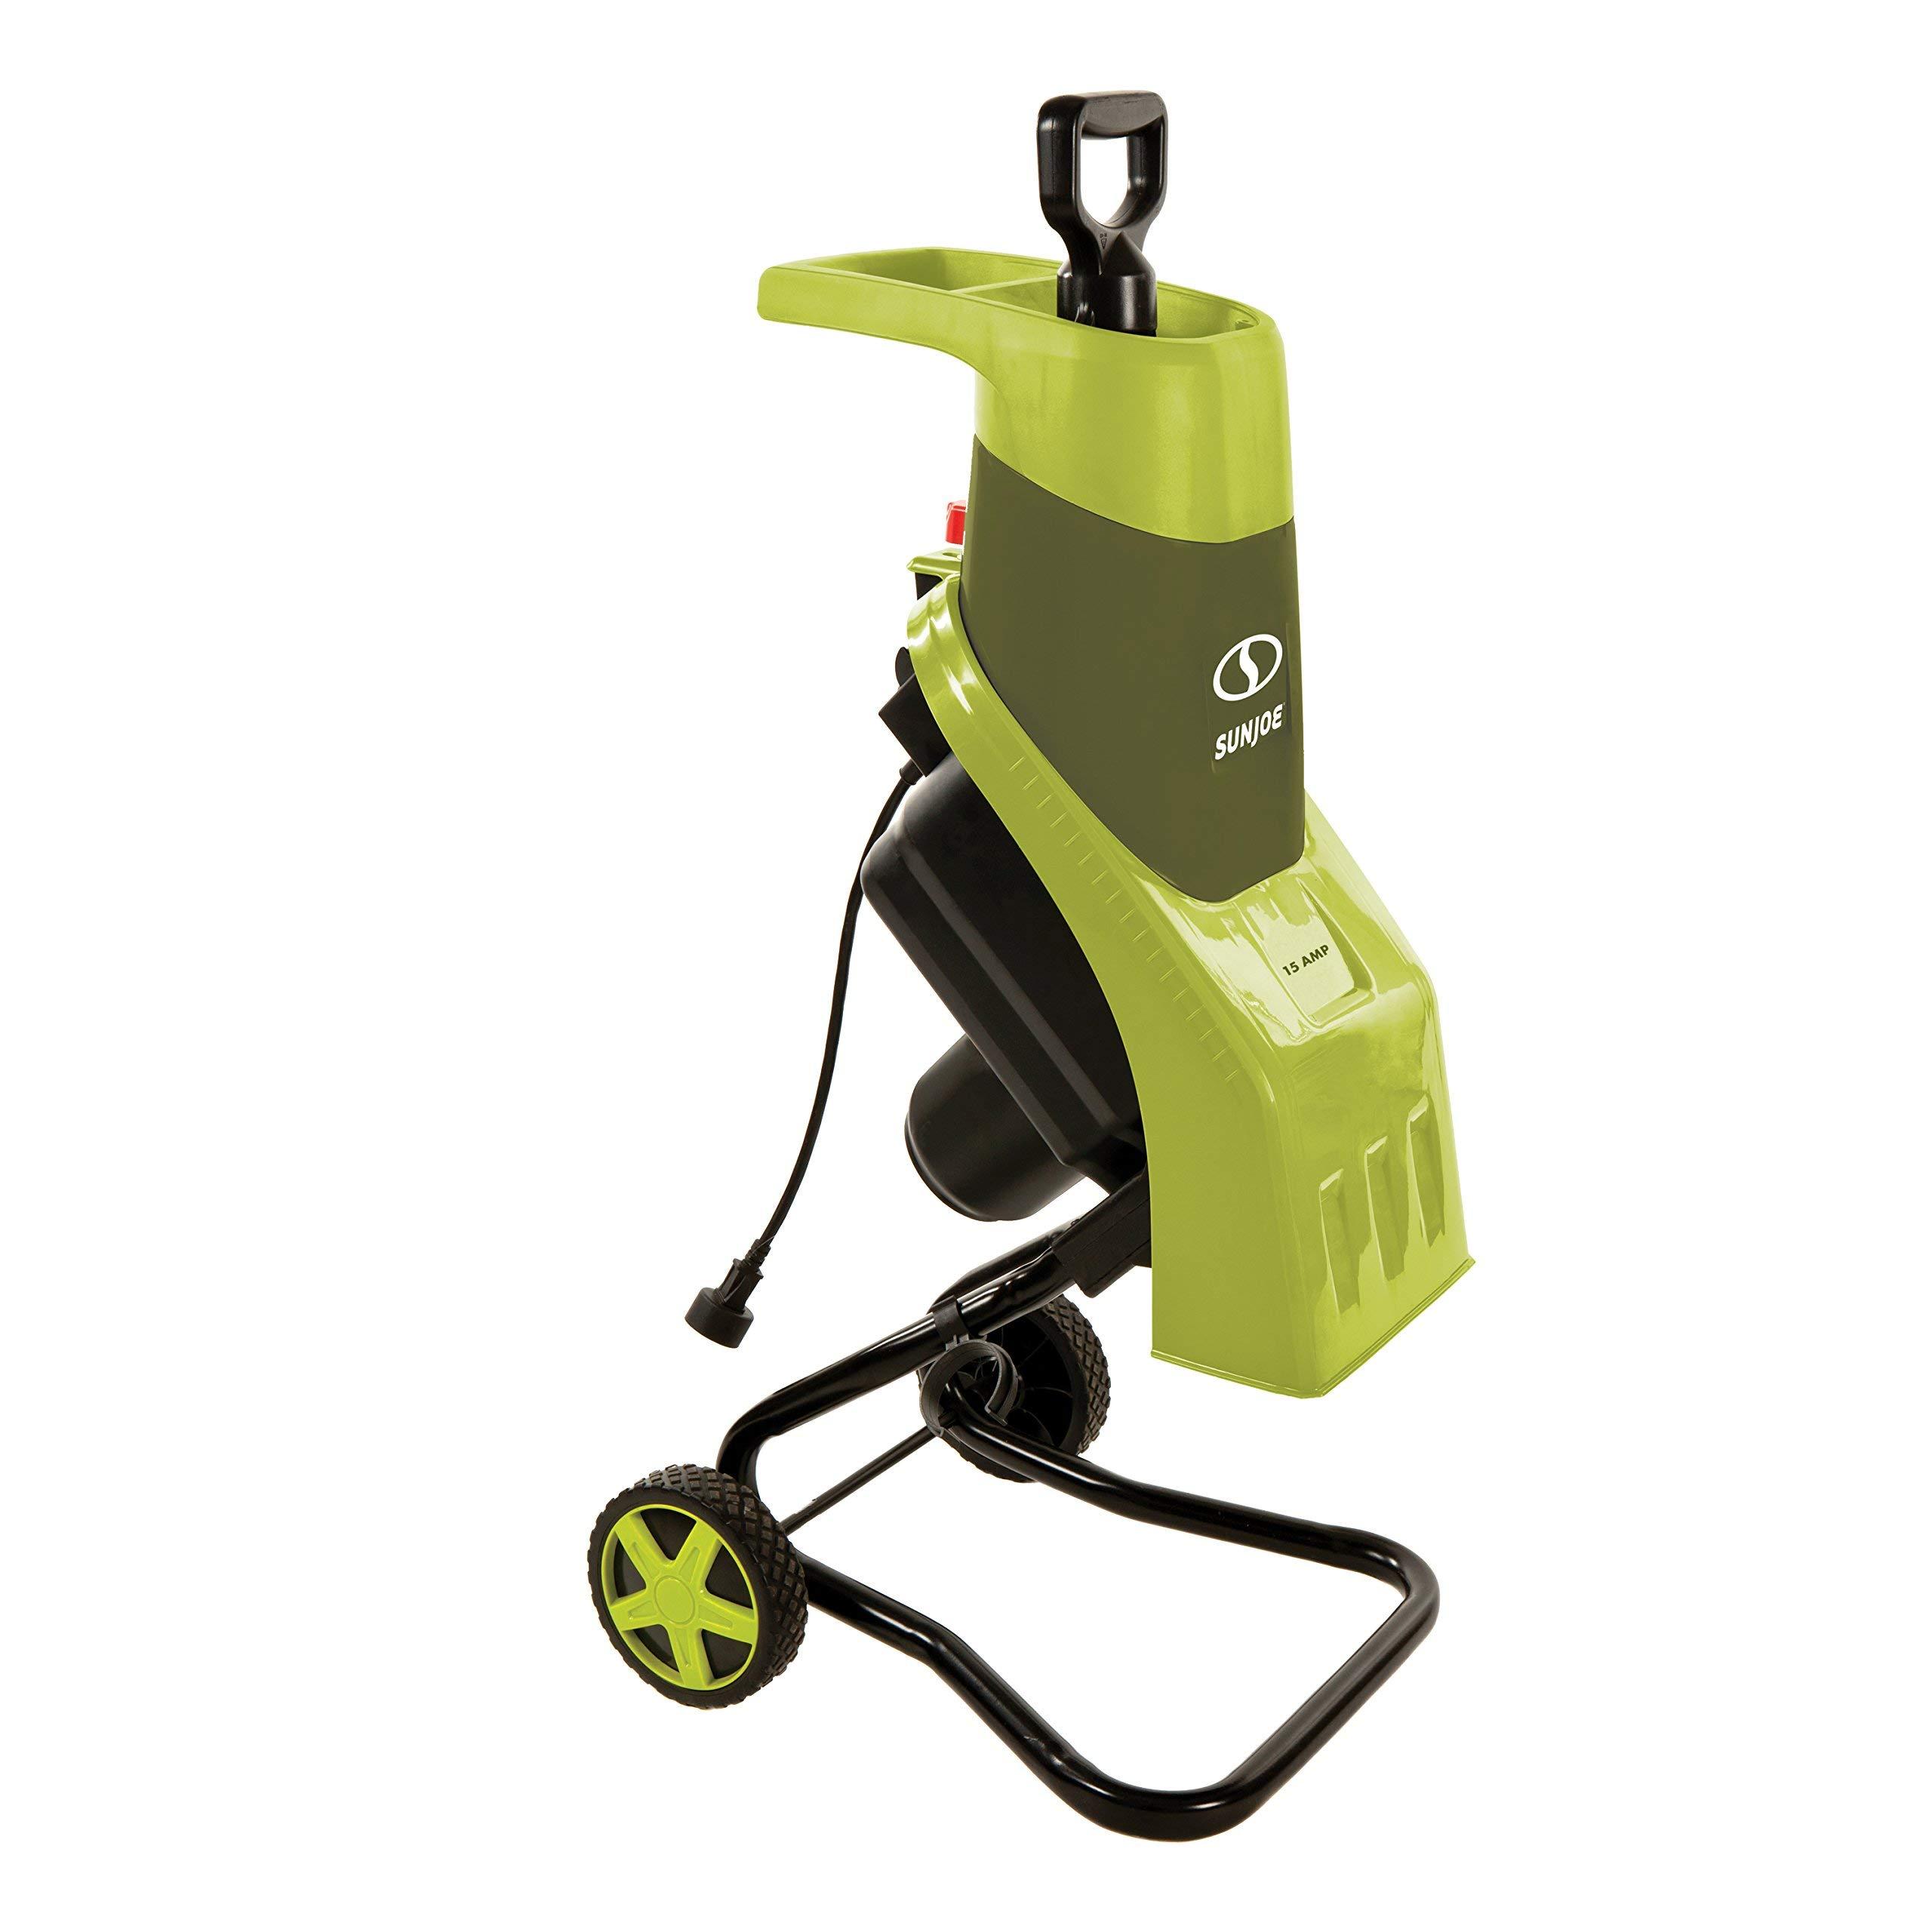 Sun Joe CJ602E 15-Amp Electric Wood Chipper/Shredder, Green (Renewed)